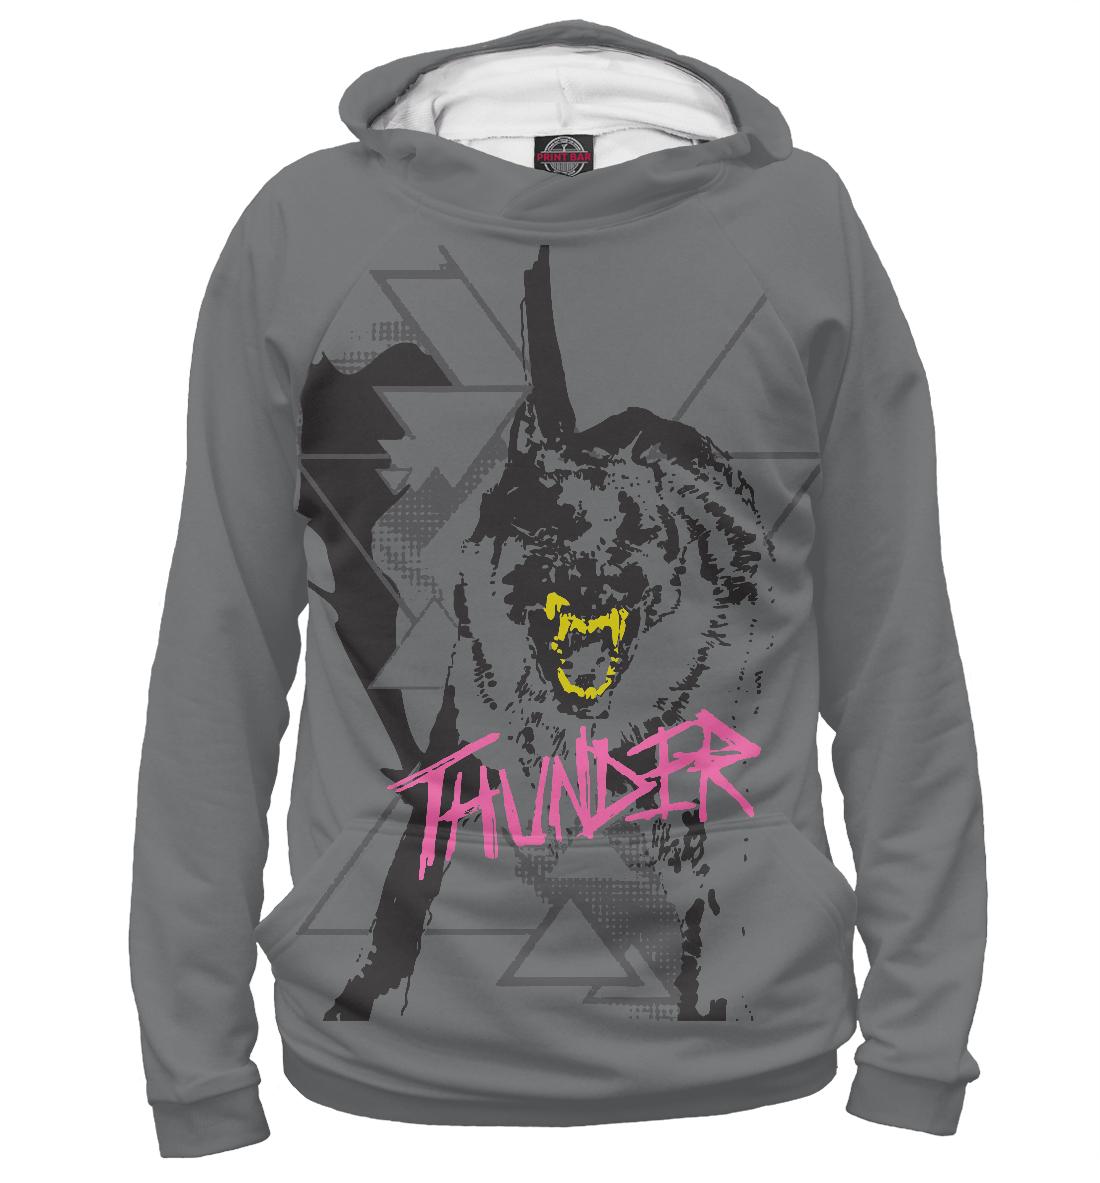 The Prodigy - Thunder john conrad what the thunder said